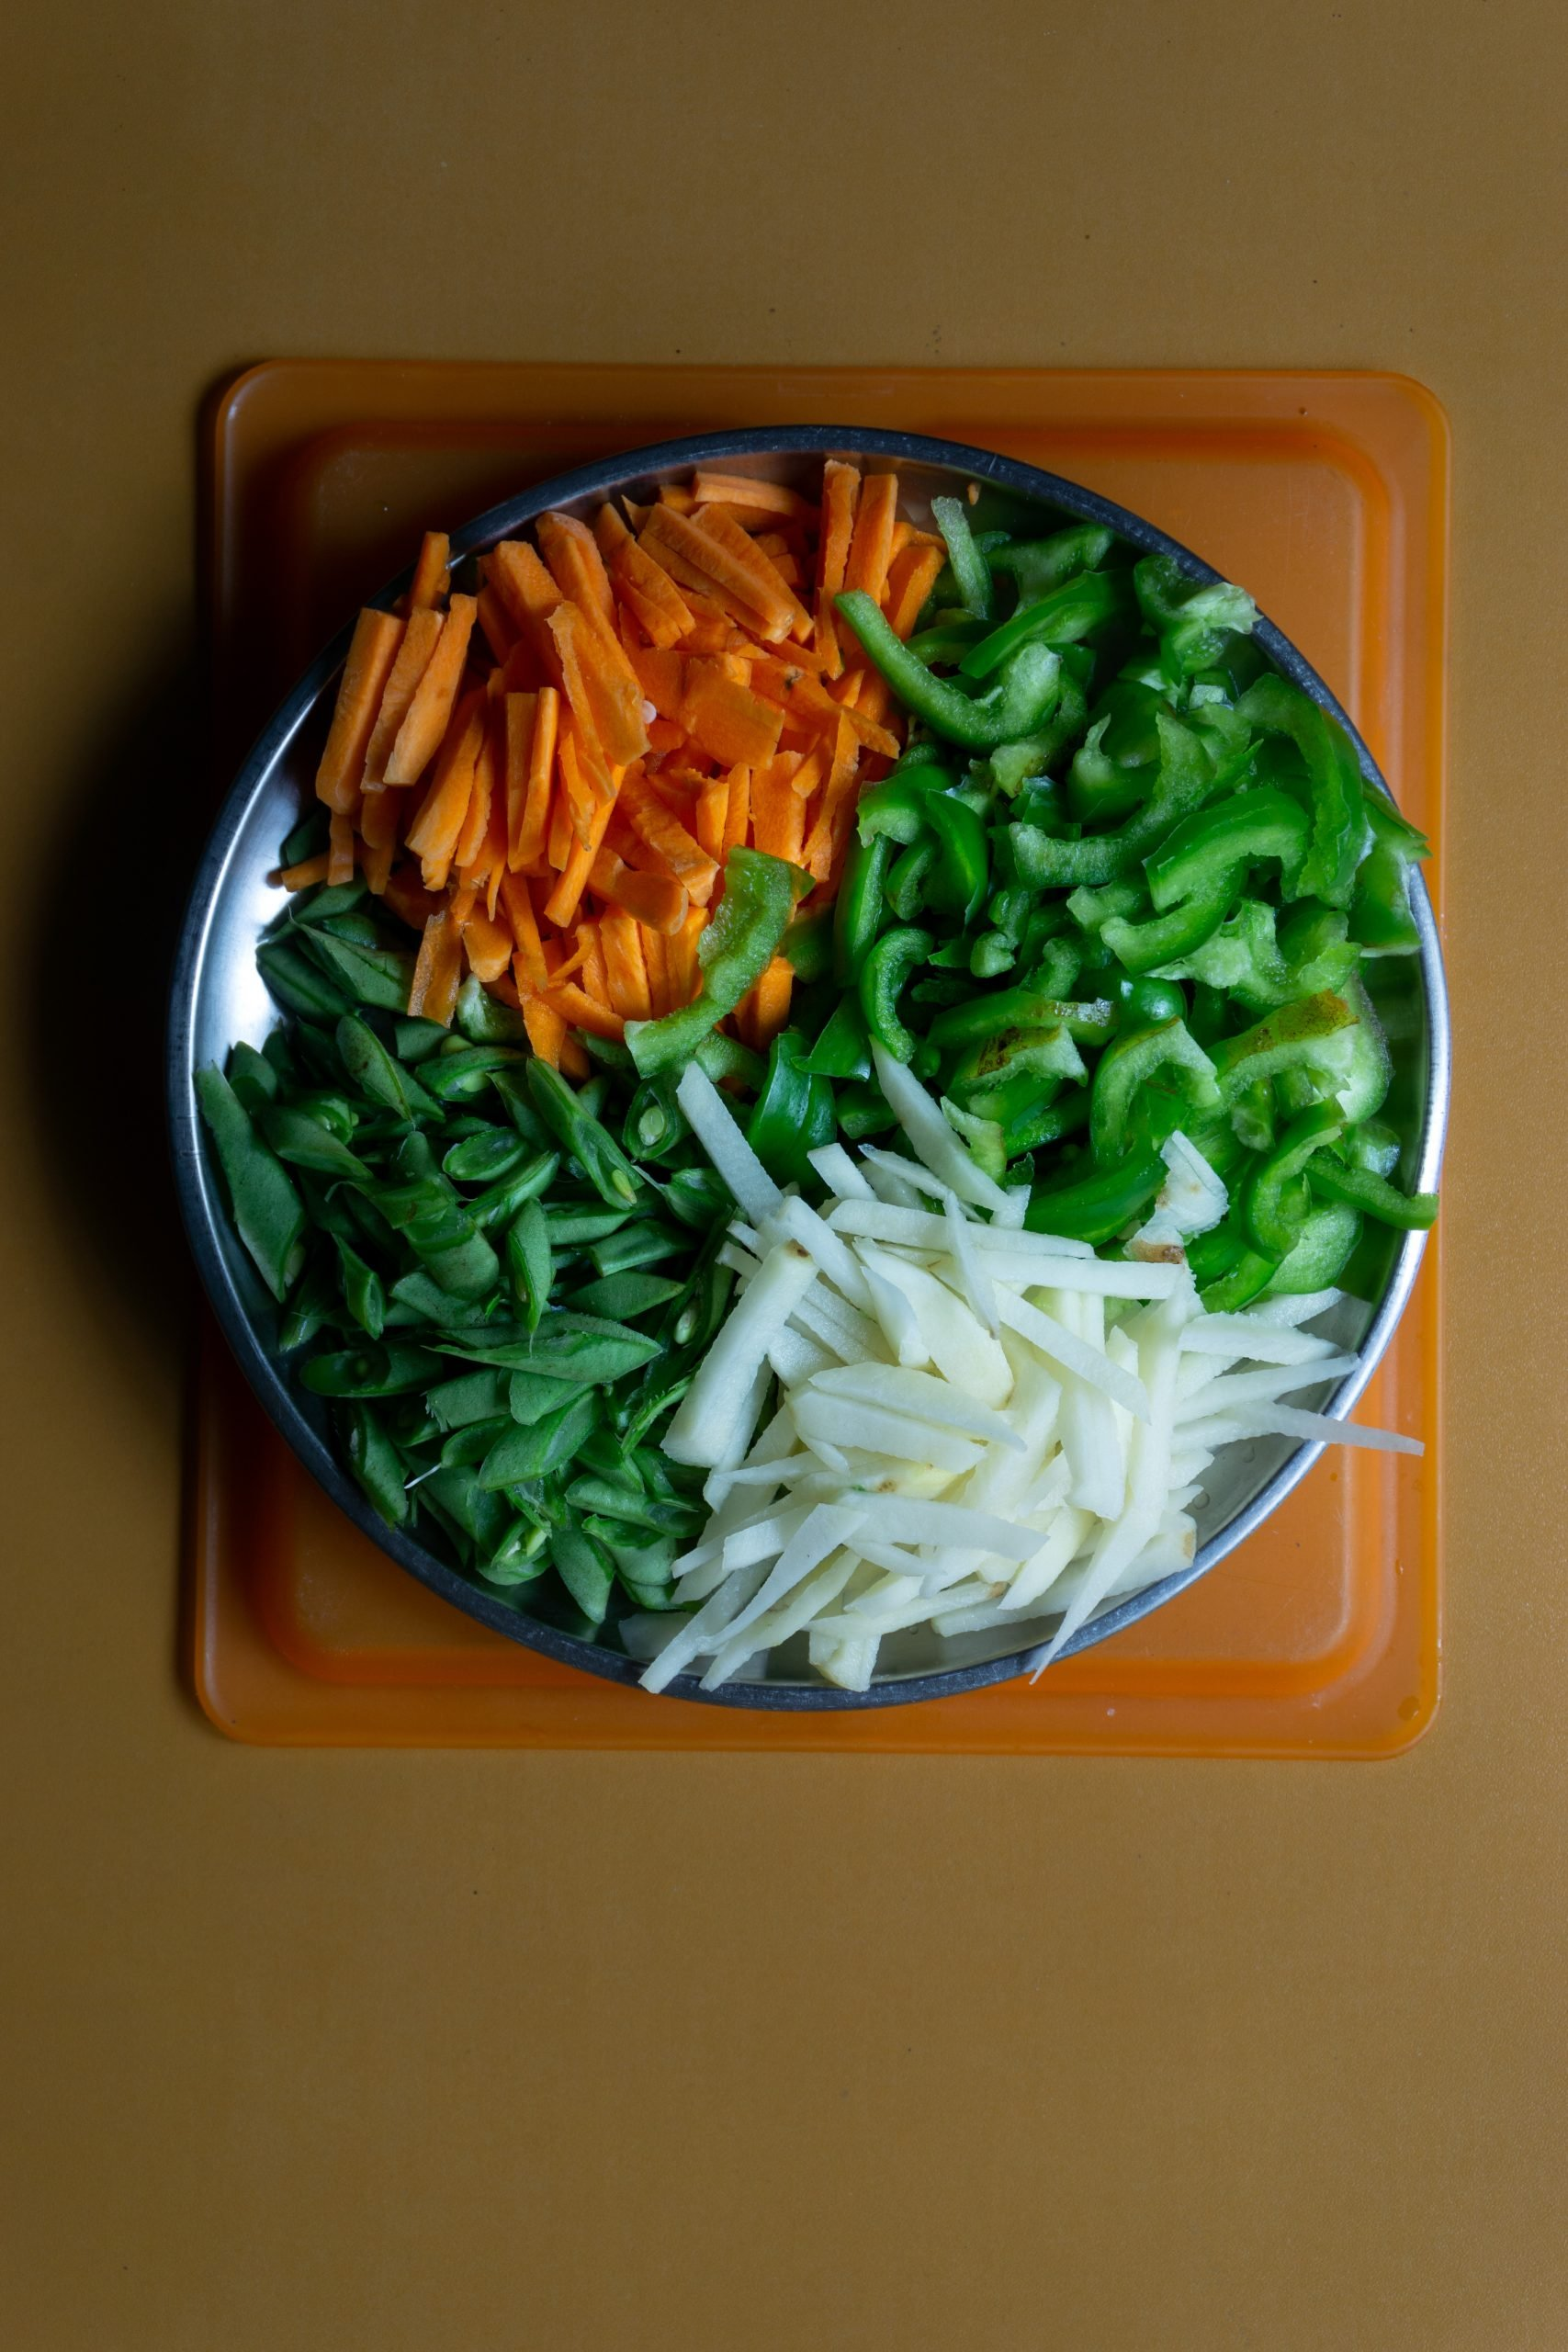 Vegetables in plate